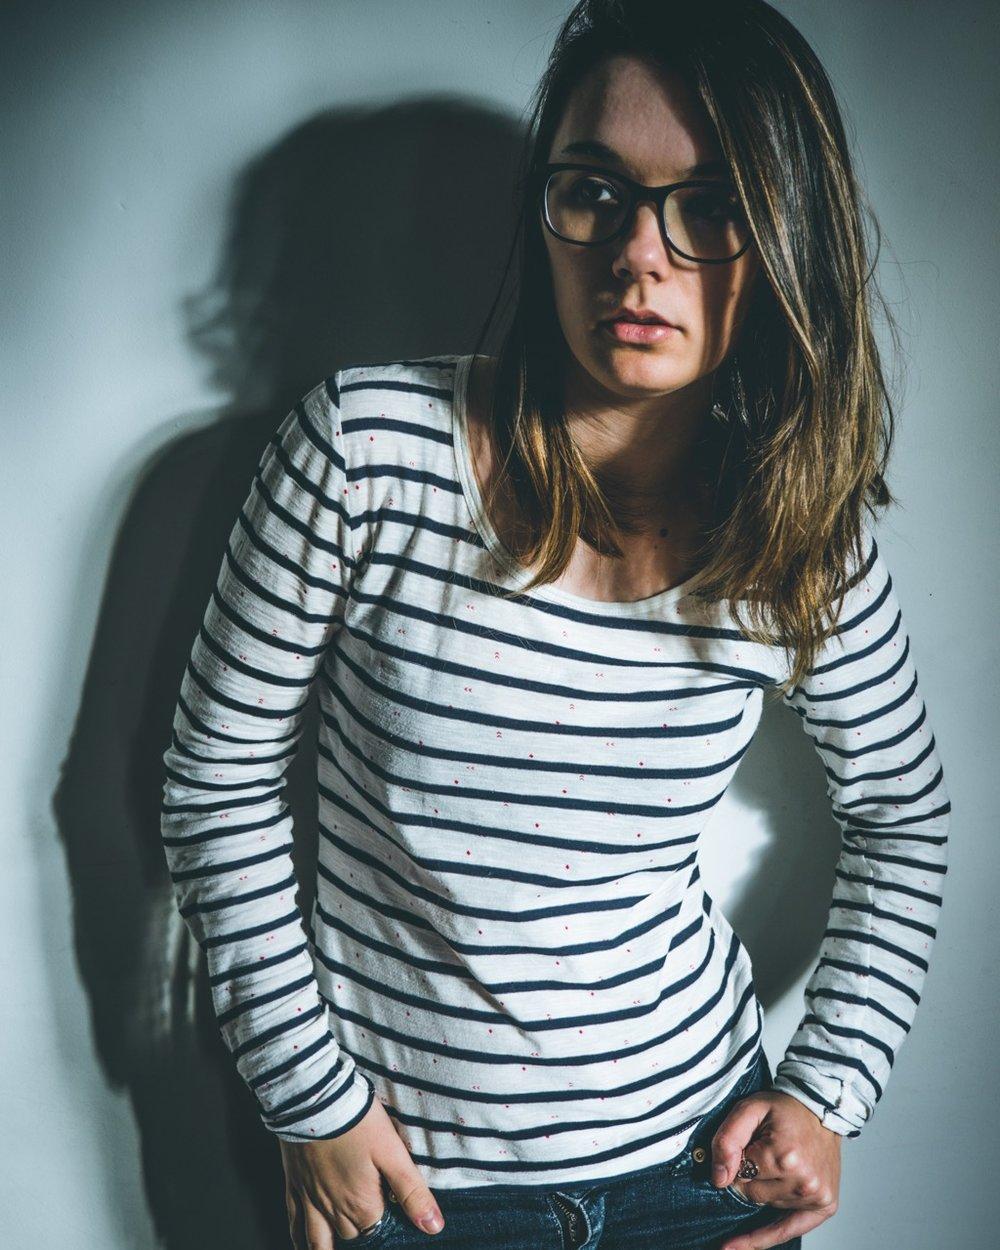 Claire Idrac